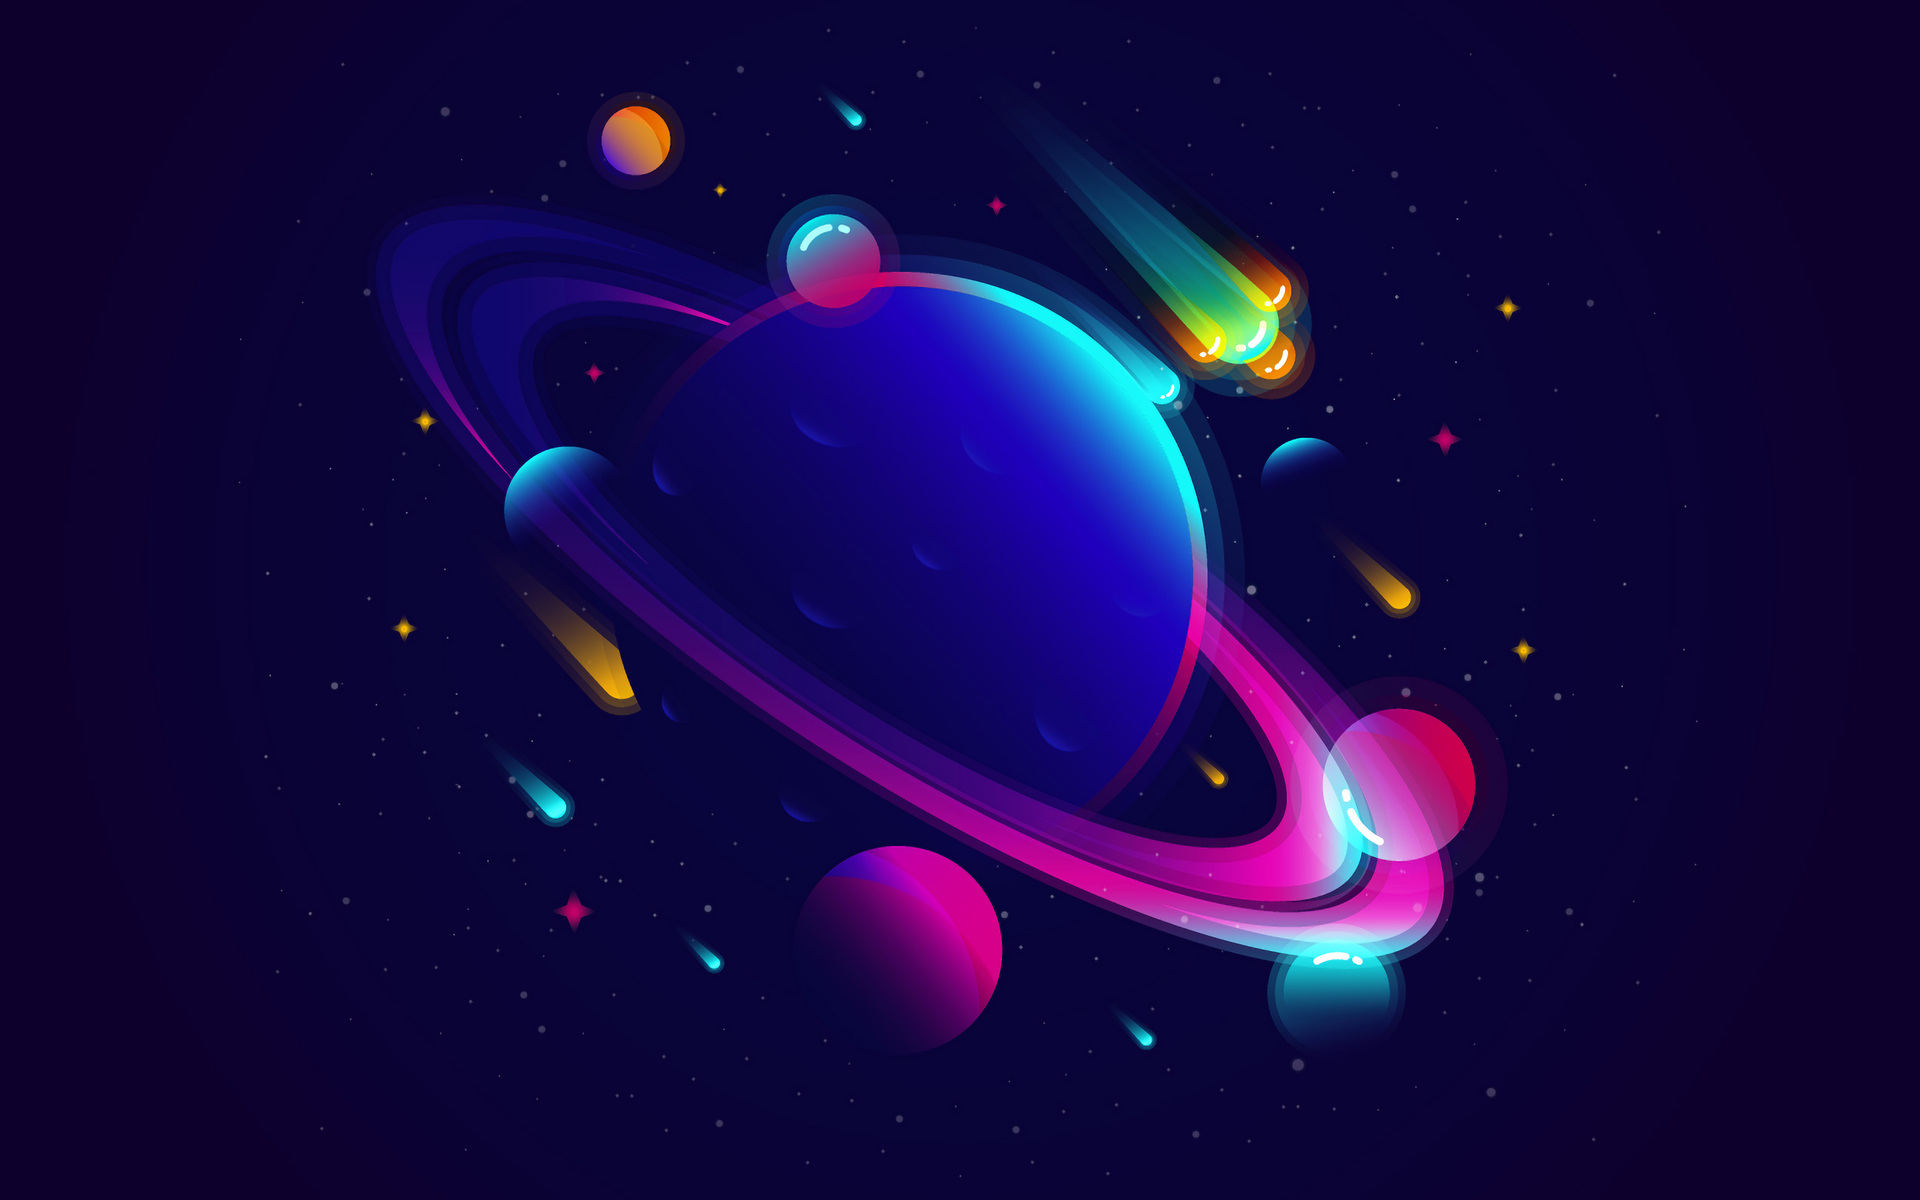 saturn-planet-illustration-minimalist-3w.jpg